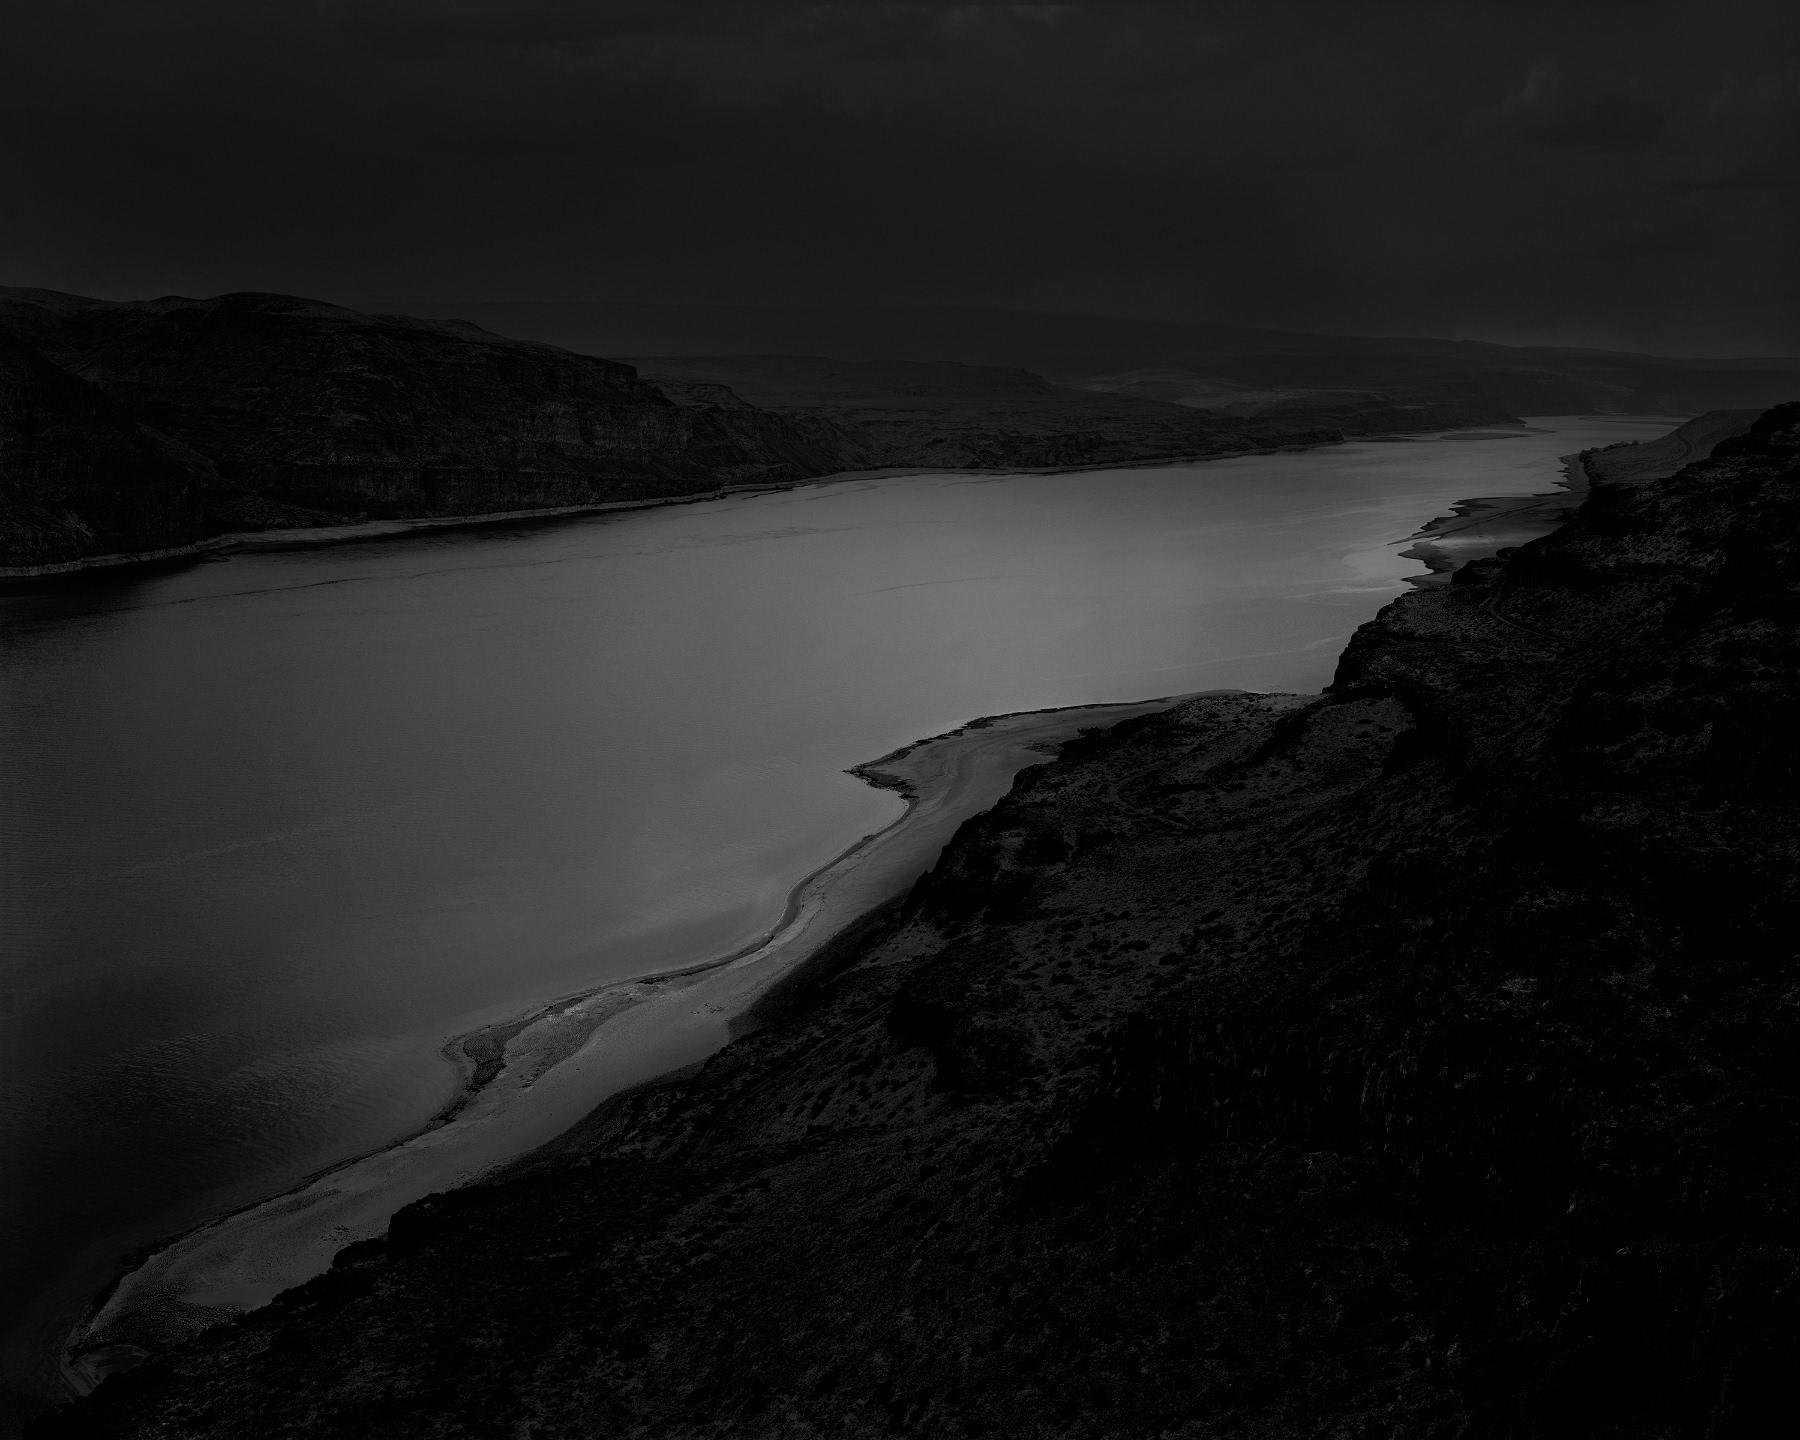 River II, 2014 © Adam Katseff